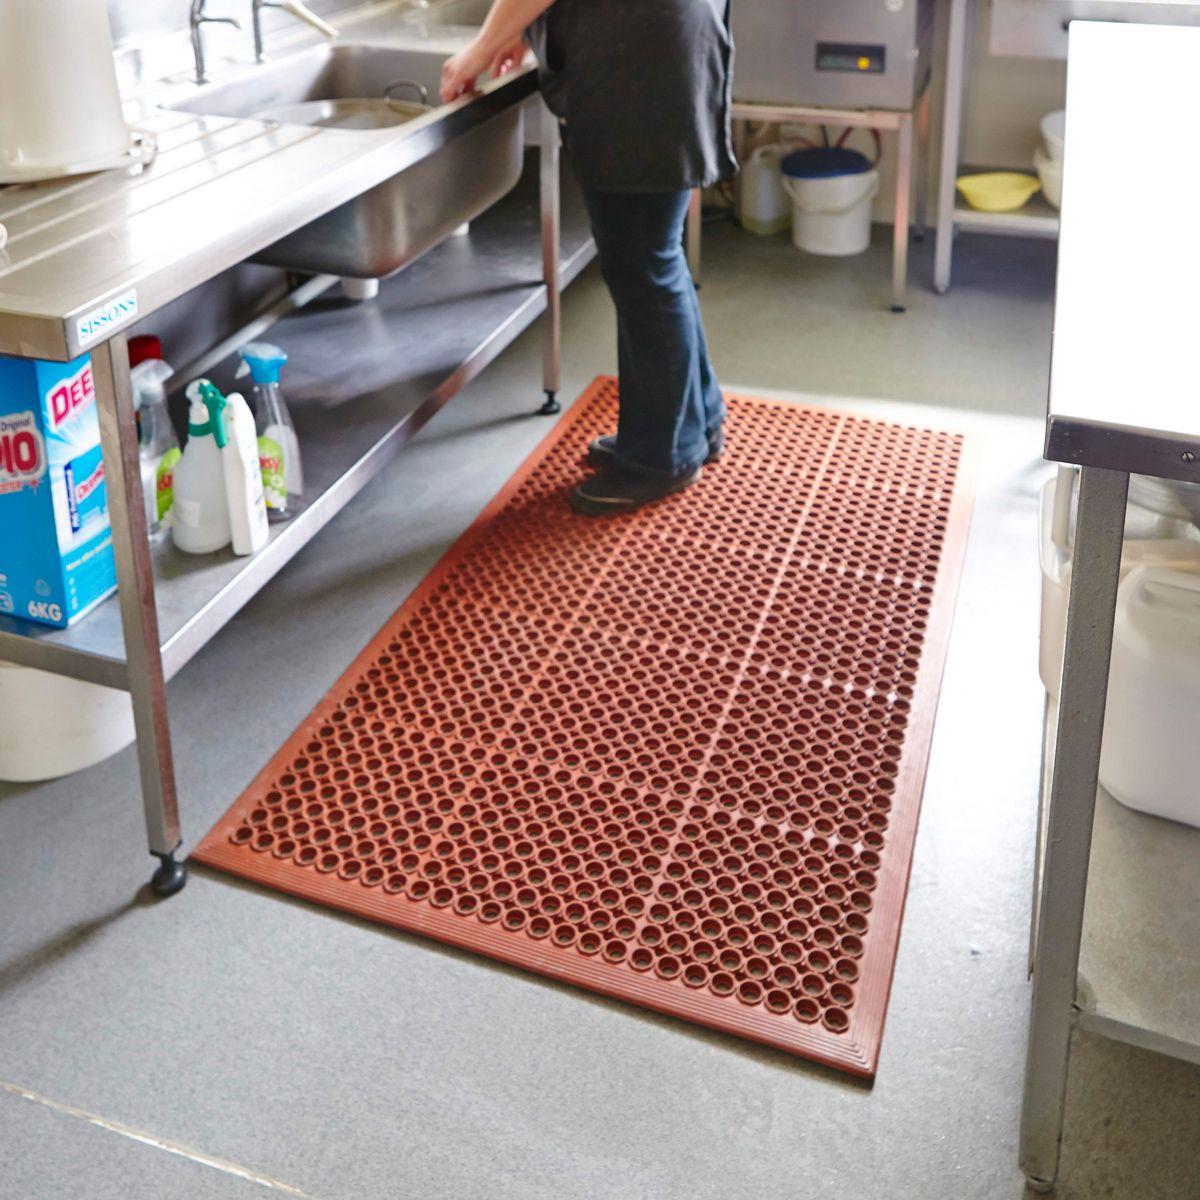 Non Slip Kitchen Floor Tiles Rubber Kitchen Floor Tiles Interior Design Medium Size Tile Floor